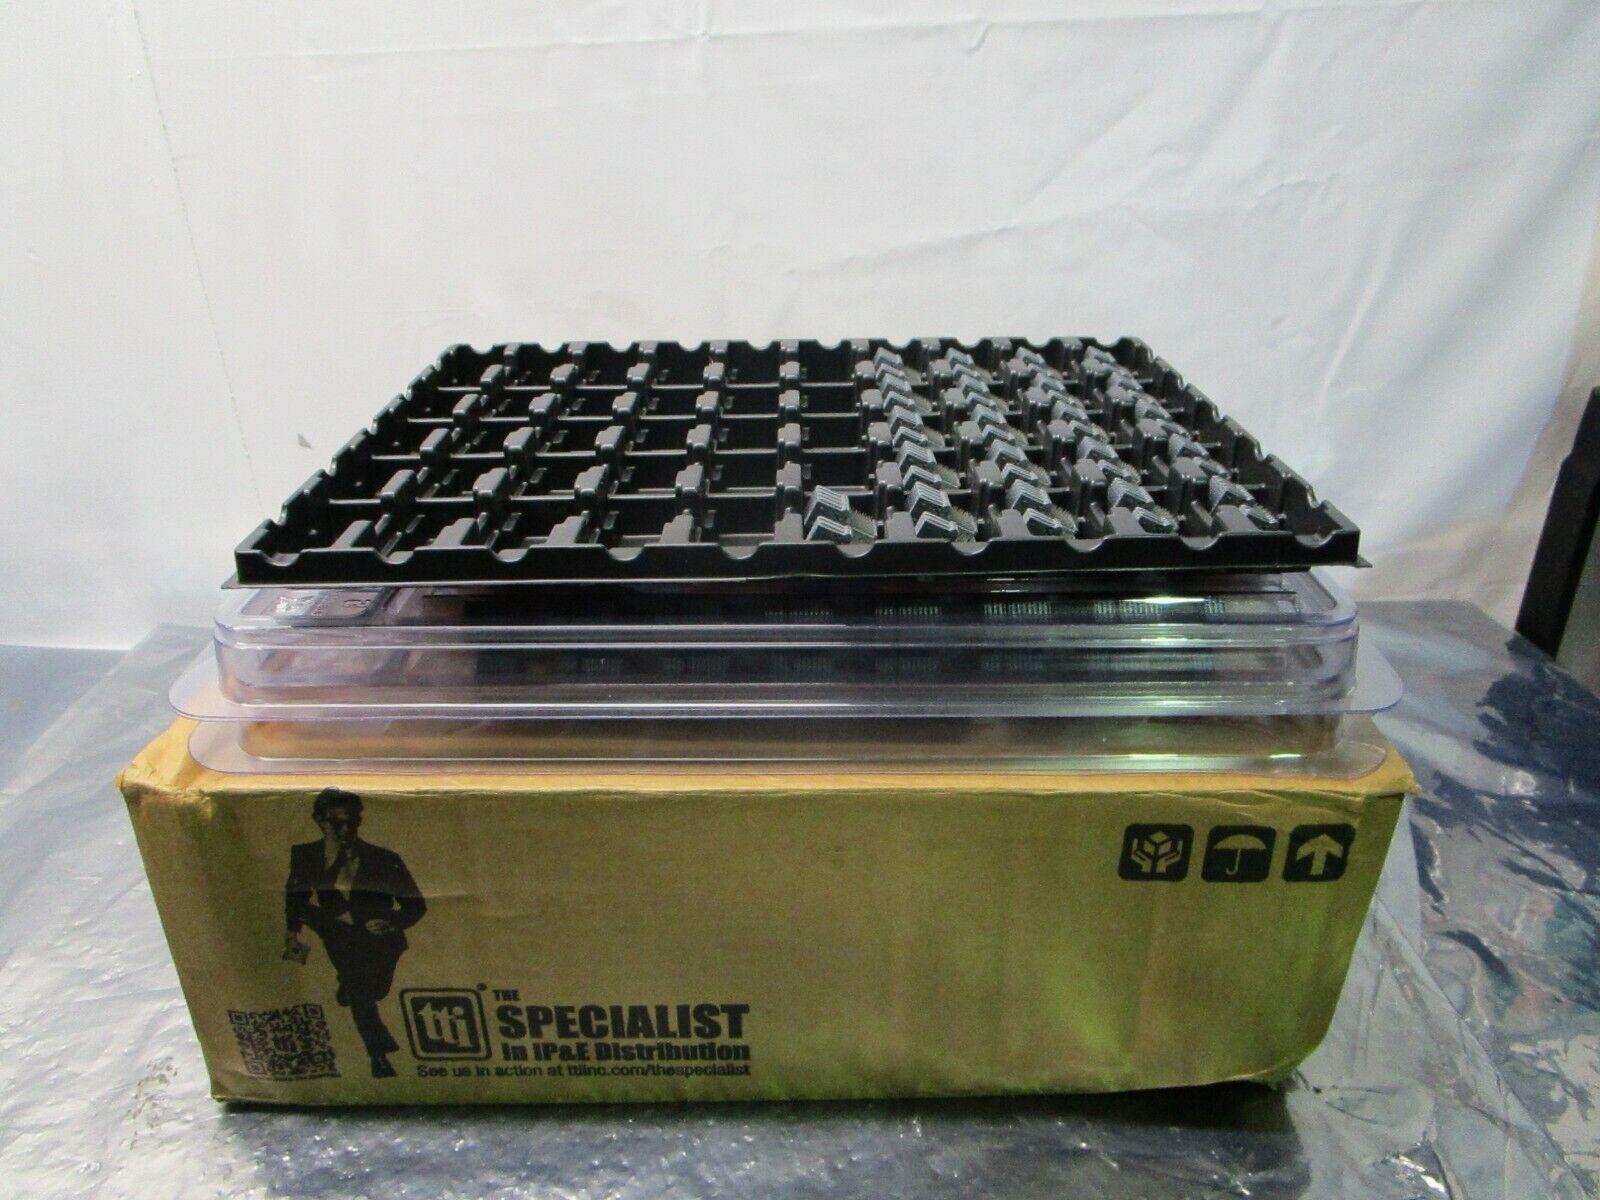 1 LOT of 105 AMPHENOL TCSJX20050062 CONNECTOR, 102062